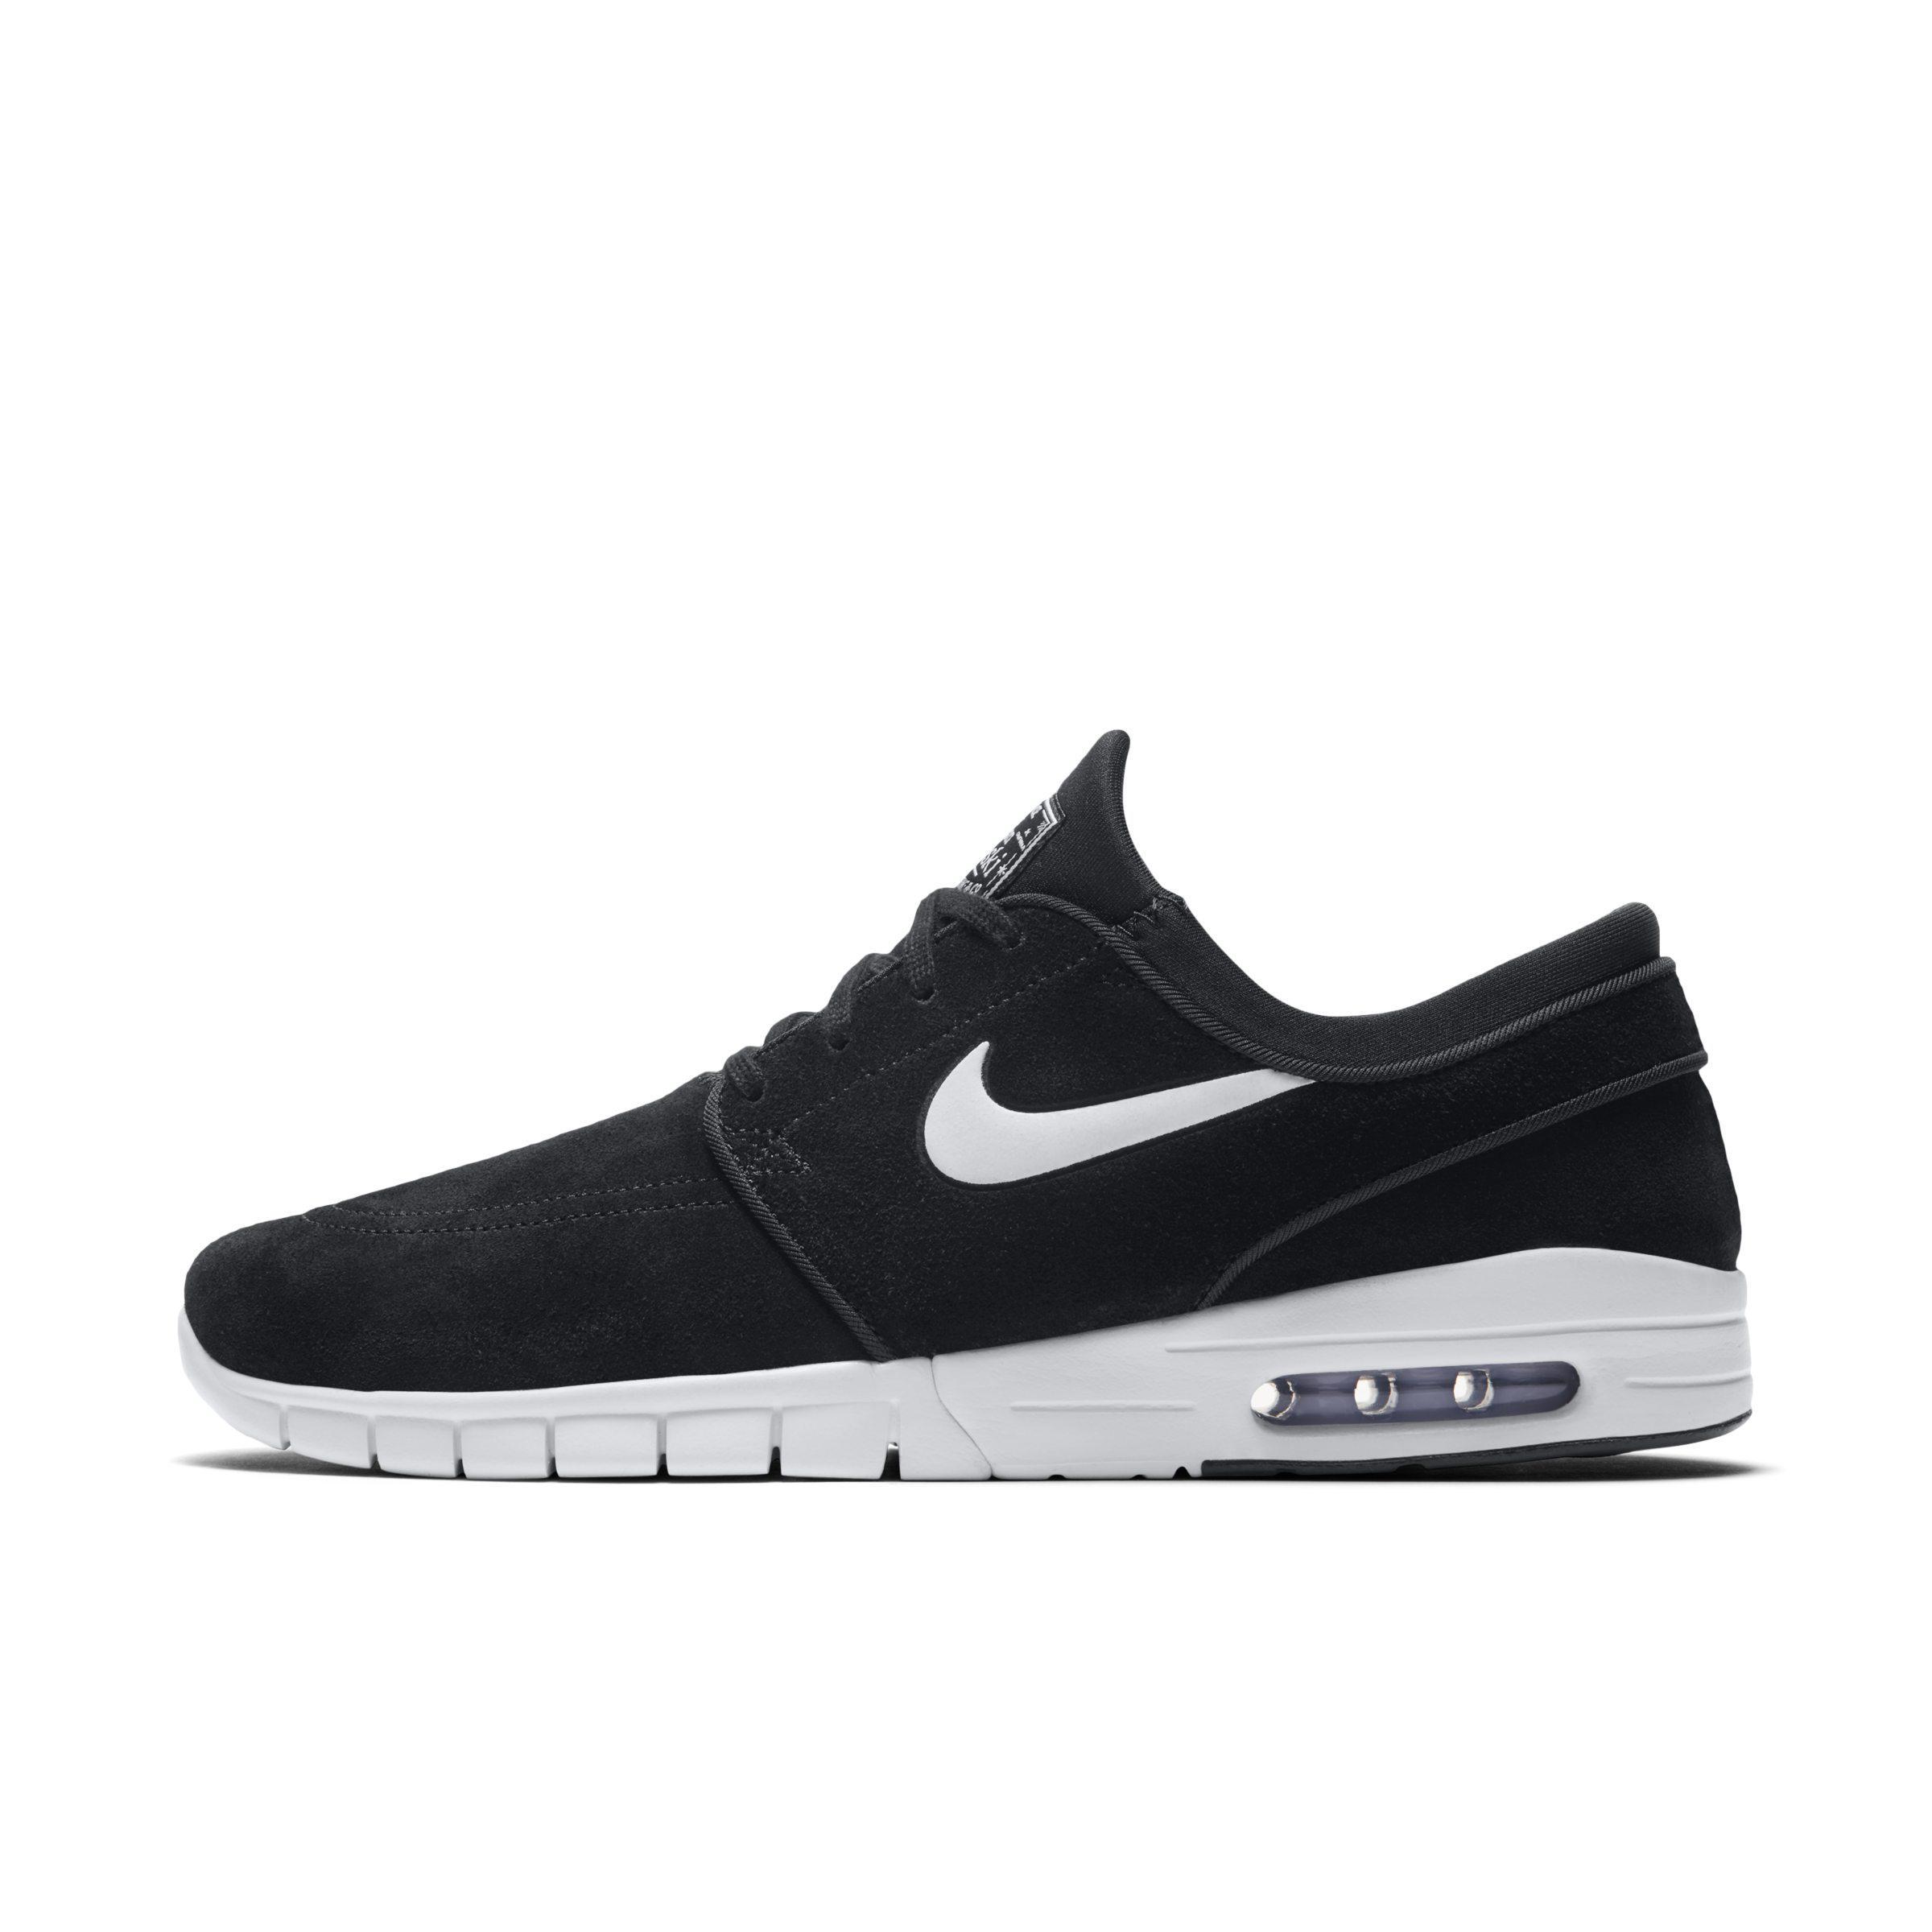 super popular d62e0 6f7c9 Nike - Black Sb Stefan Janoski Max L Skateboarding Shoe for Men - Lyst. View  fullscreen